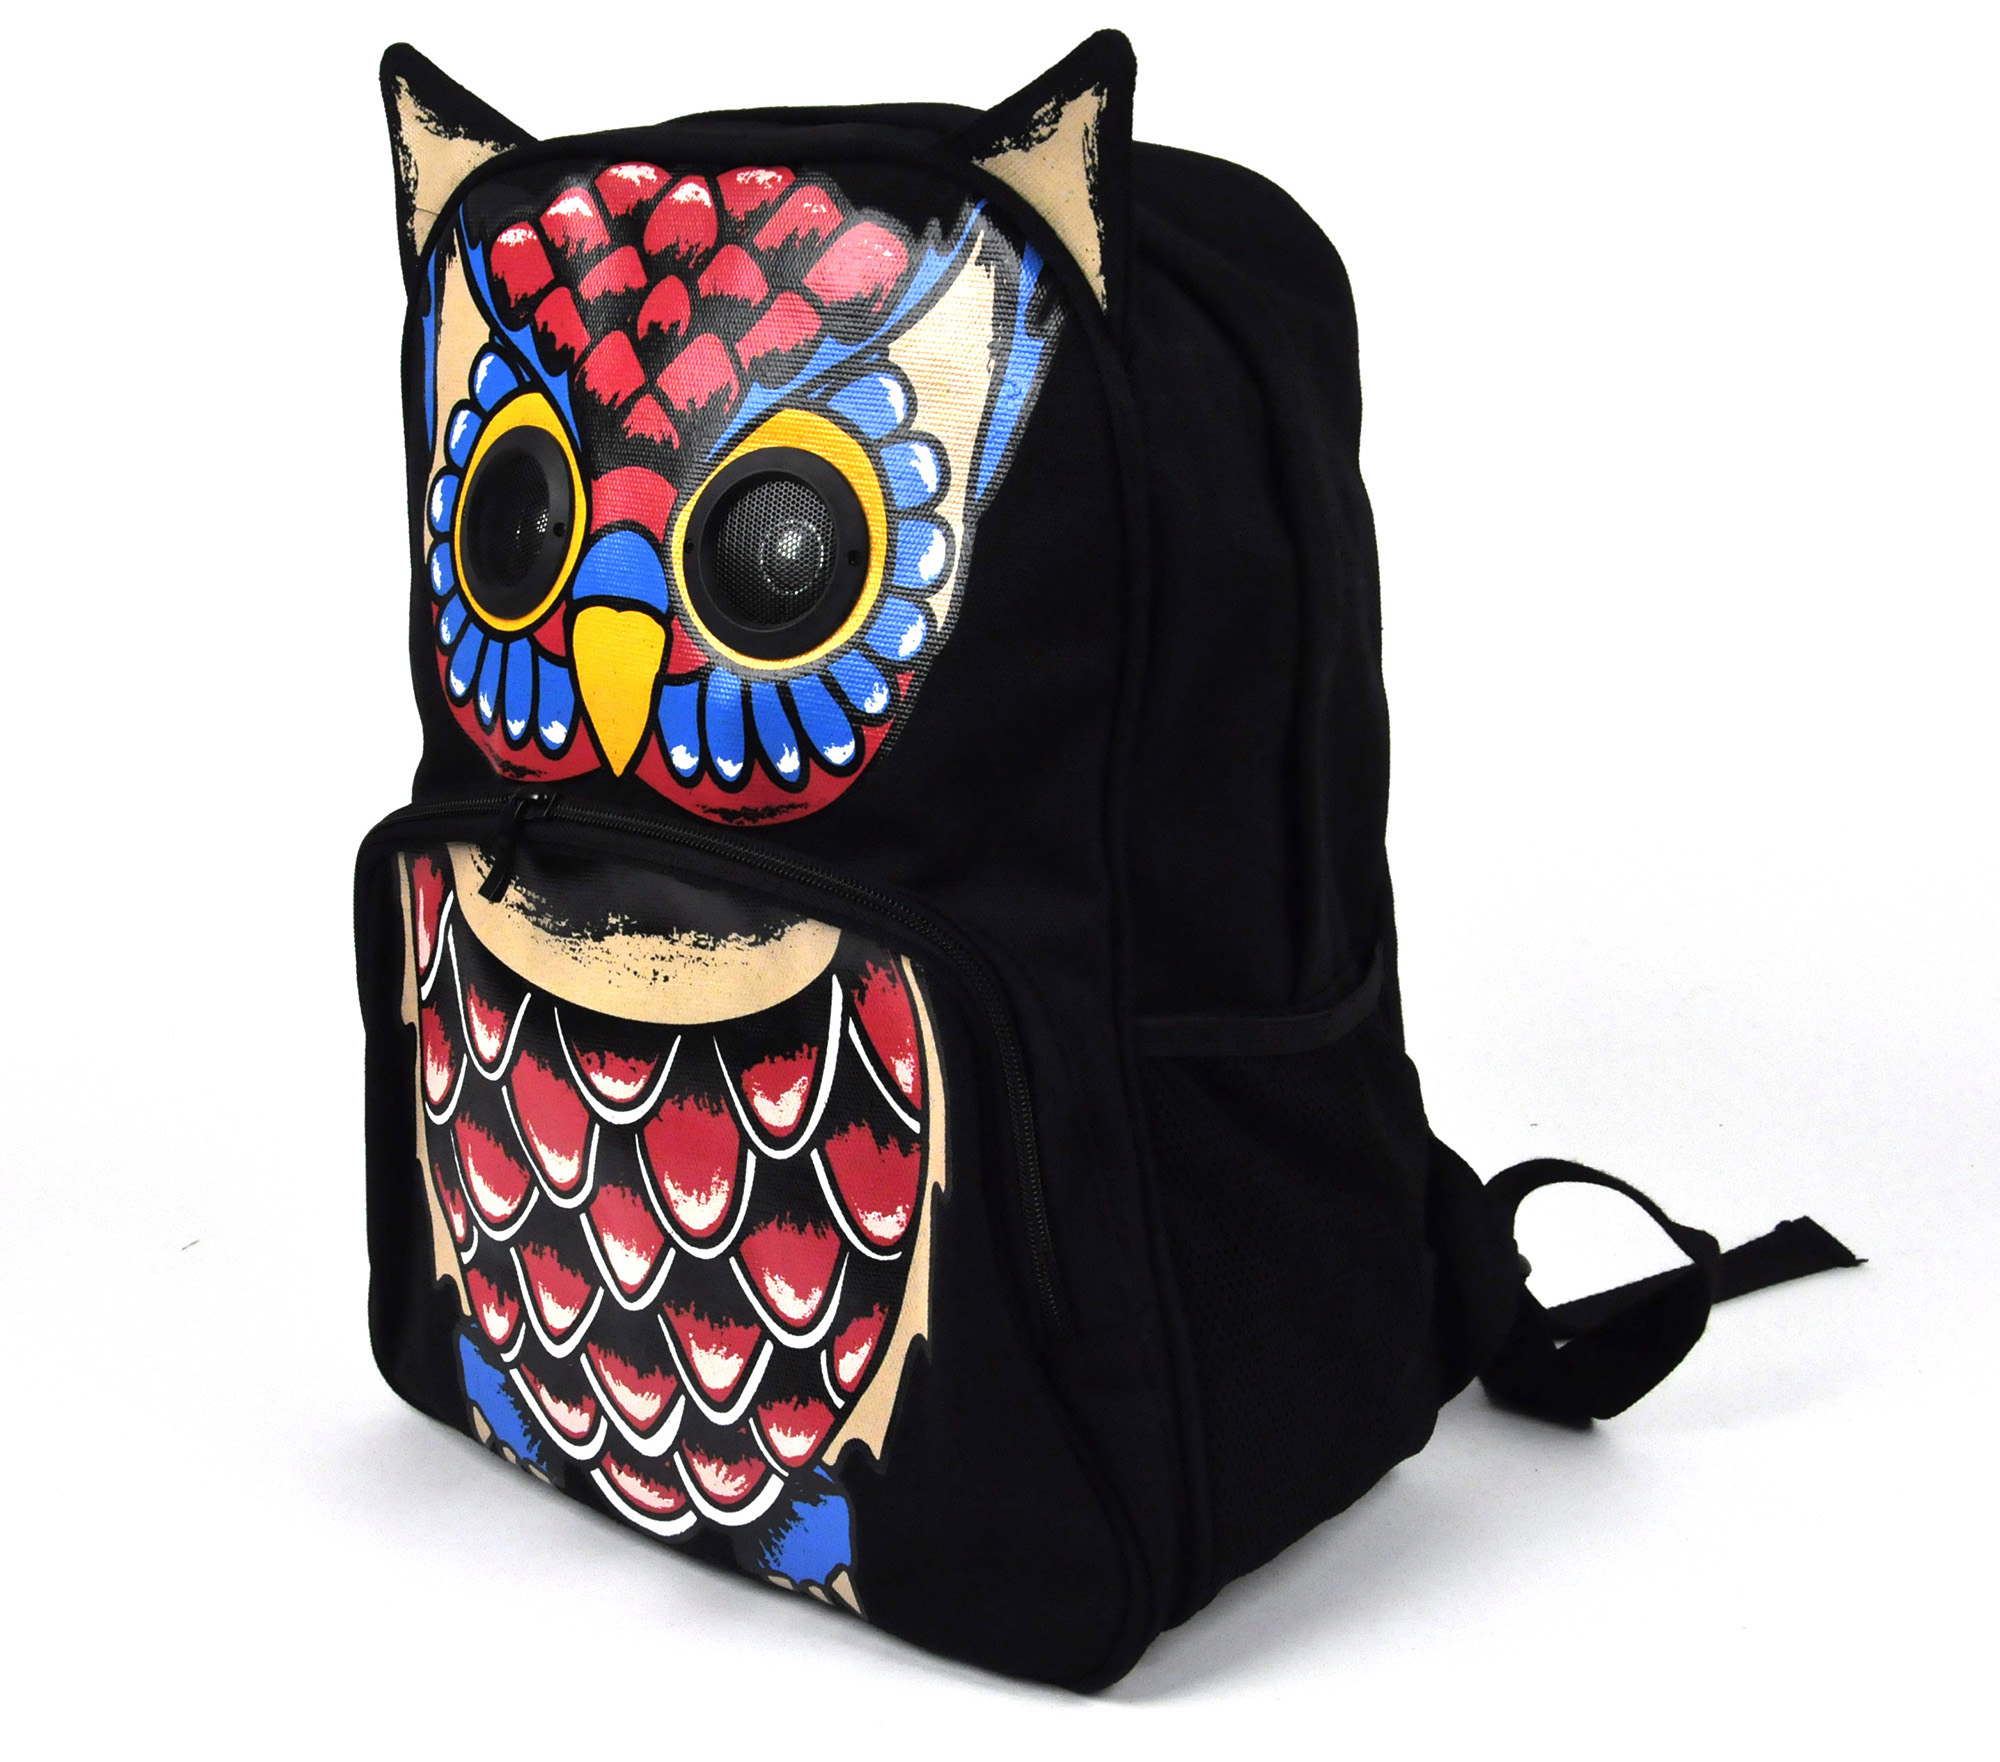 new arrival blue waterproof school backpack for boy high school bags for boys men travel bags